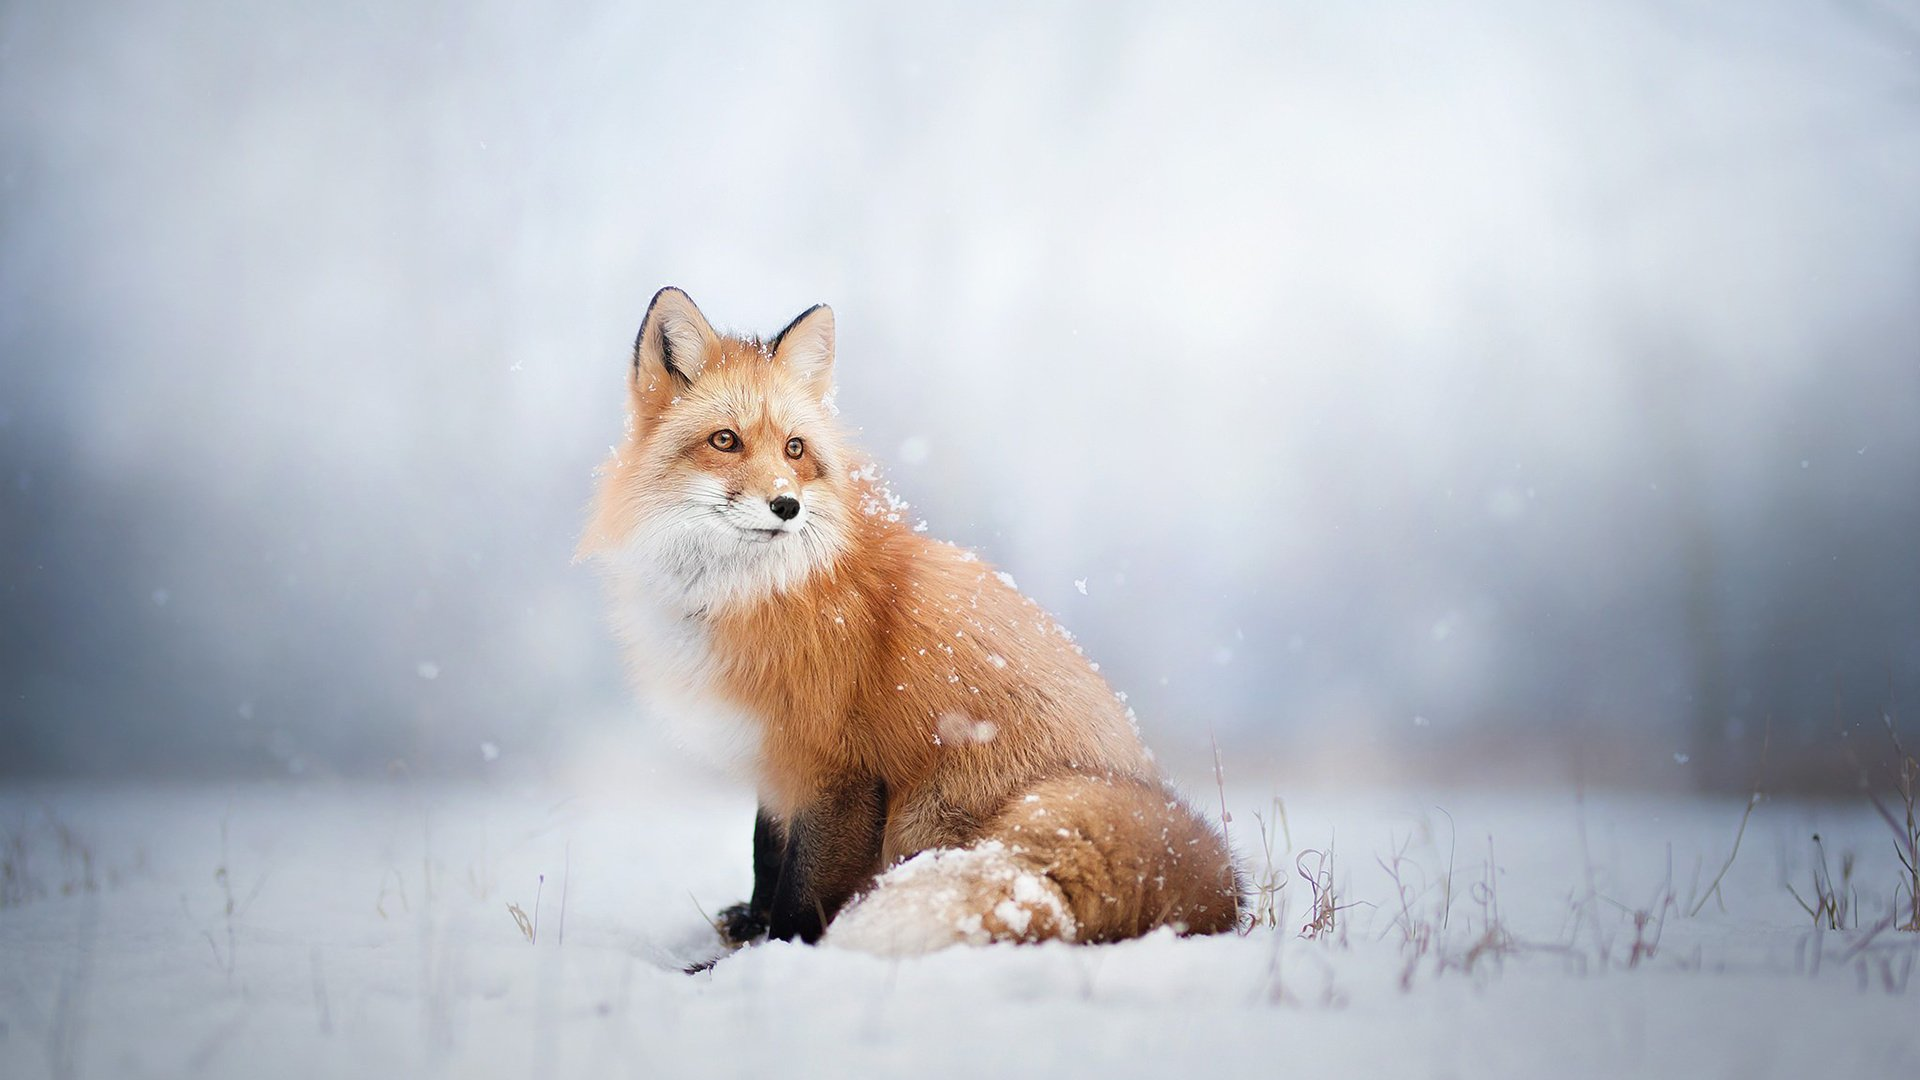 лиса природа животное снег зима без регистрации